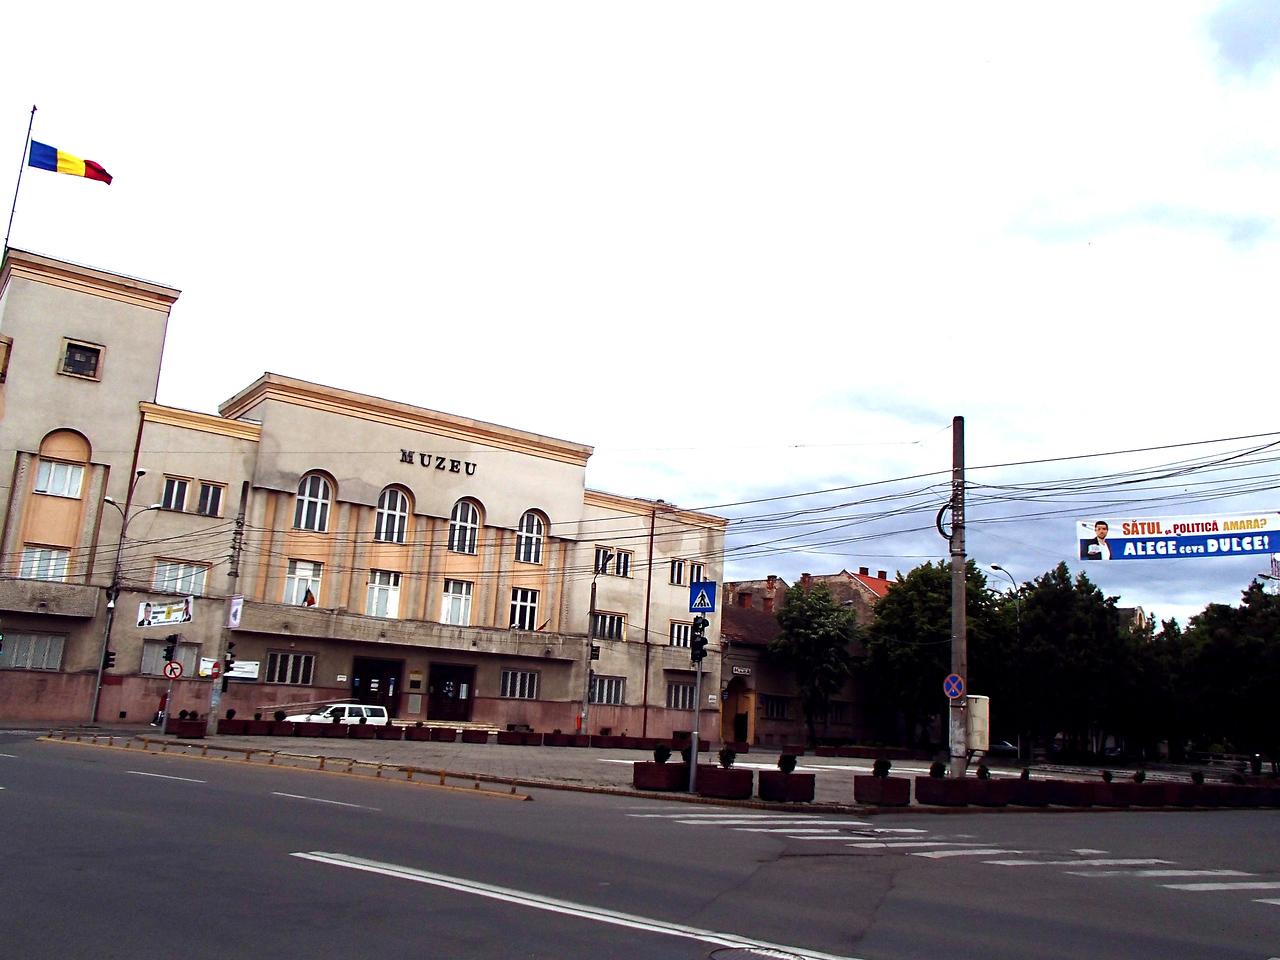 0114 Szatmar corner of Sugar ut and Arpad utca where we lived